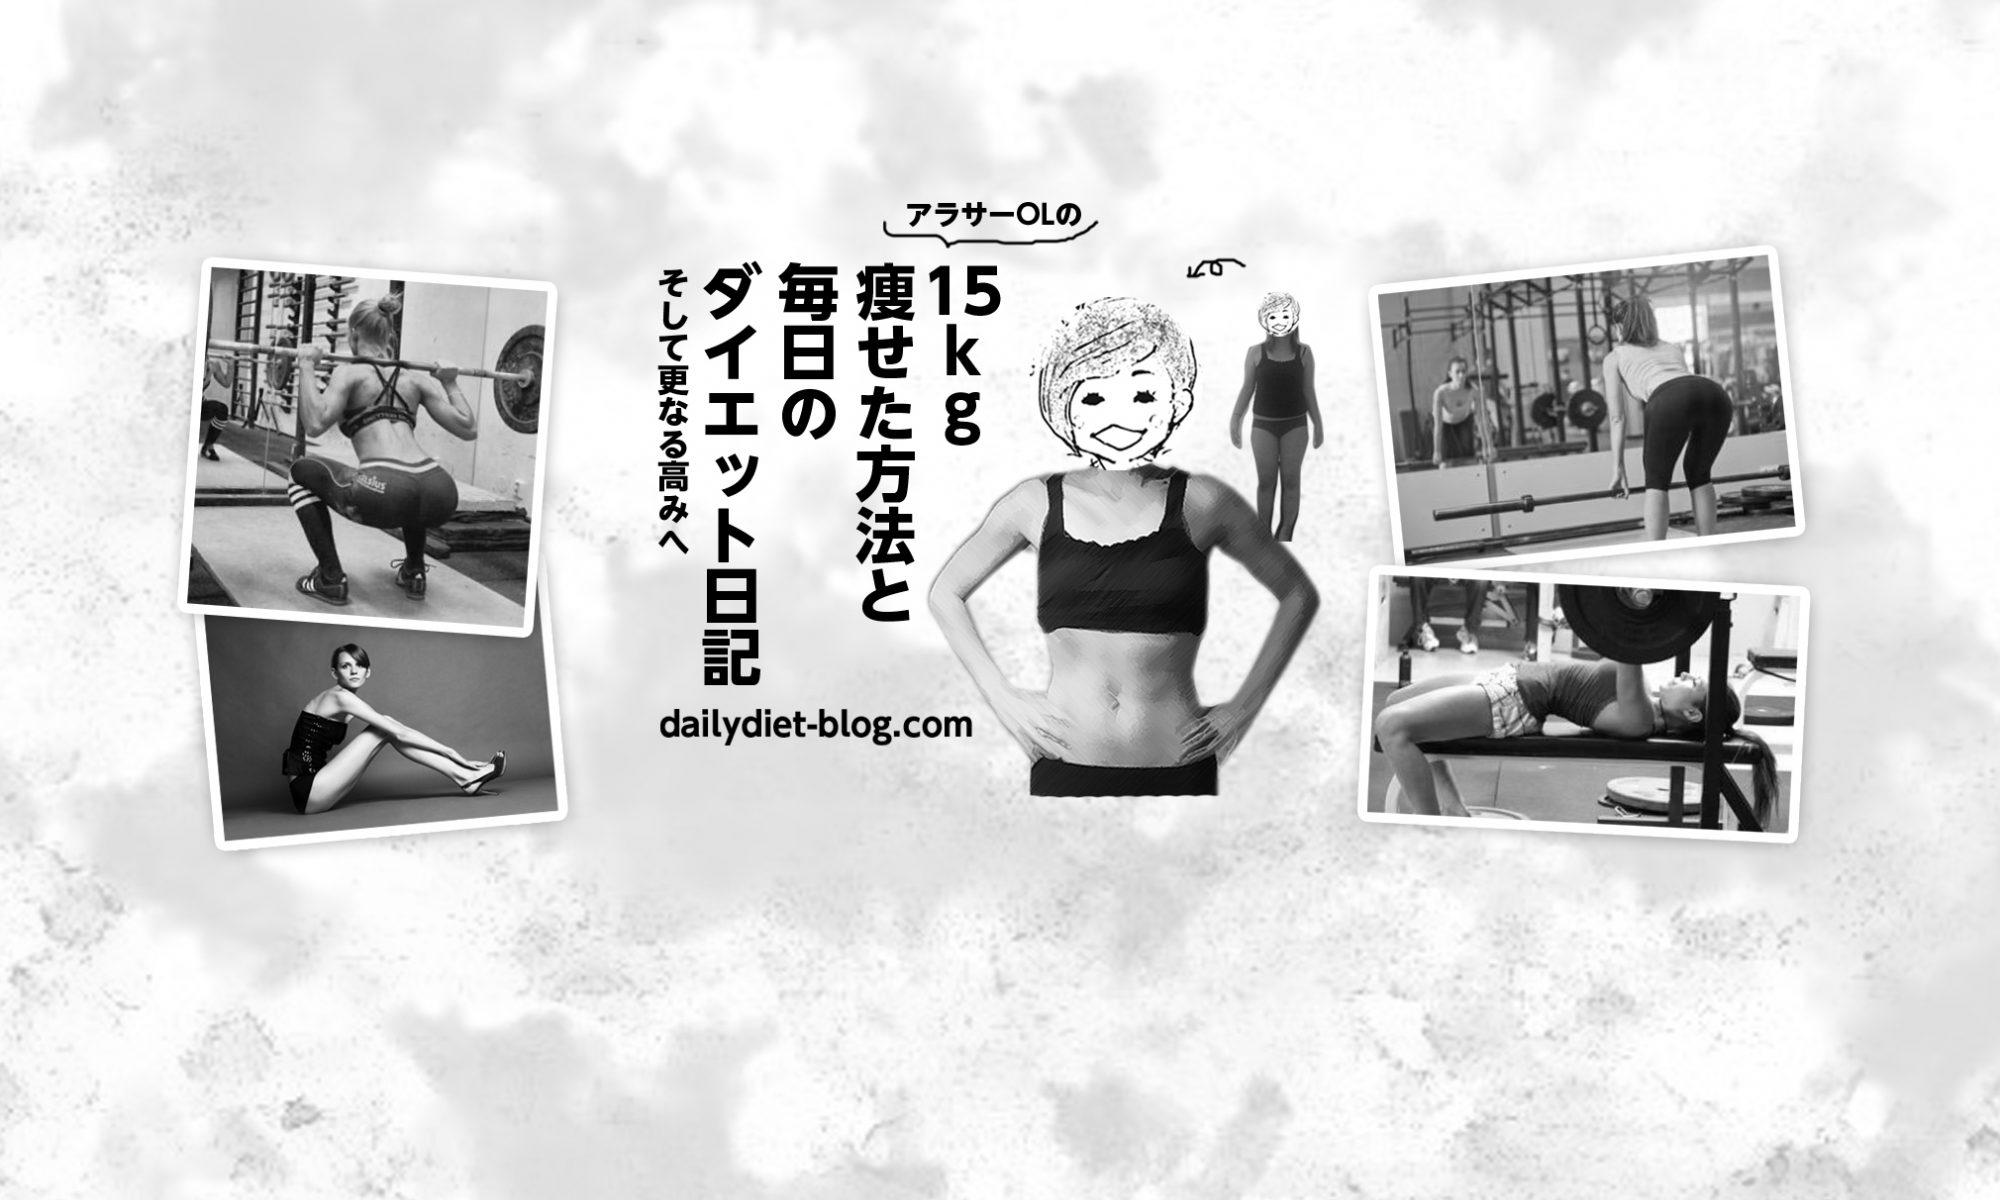 15kg痩せた方法と毎日のダイエット日記